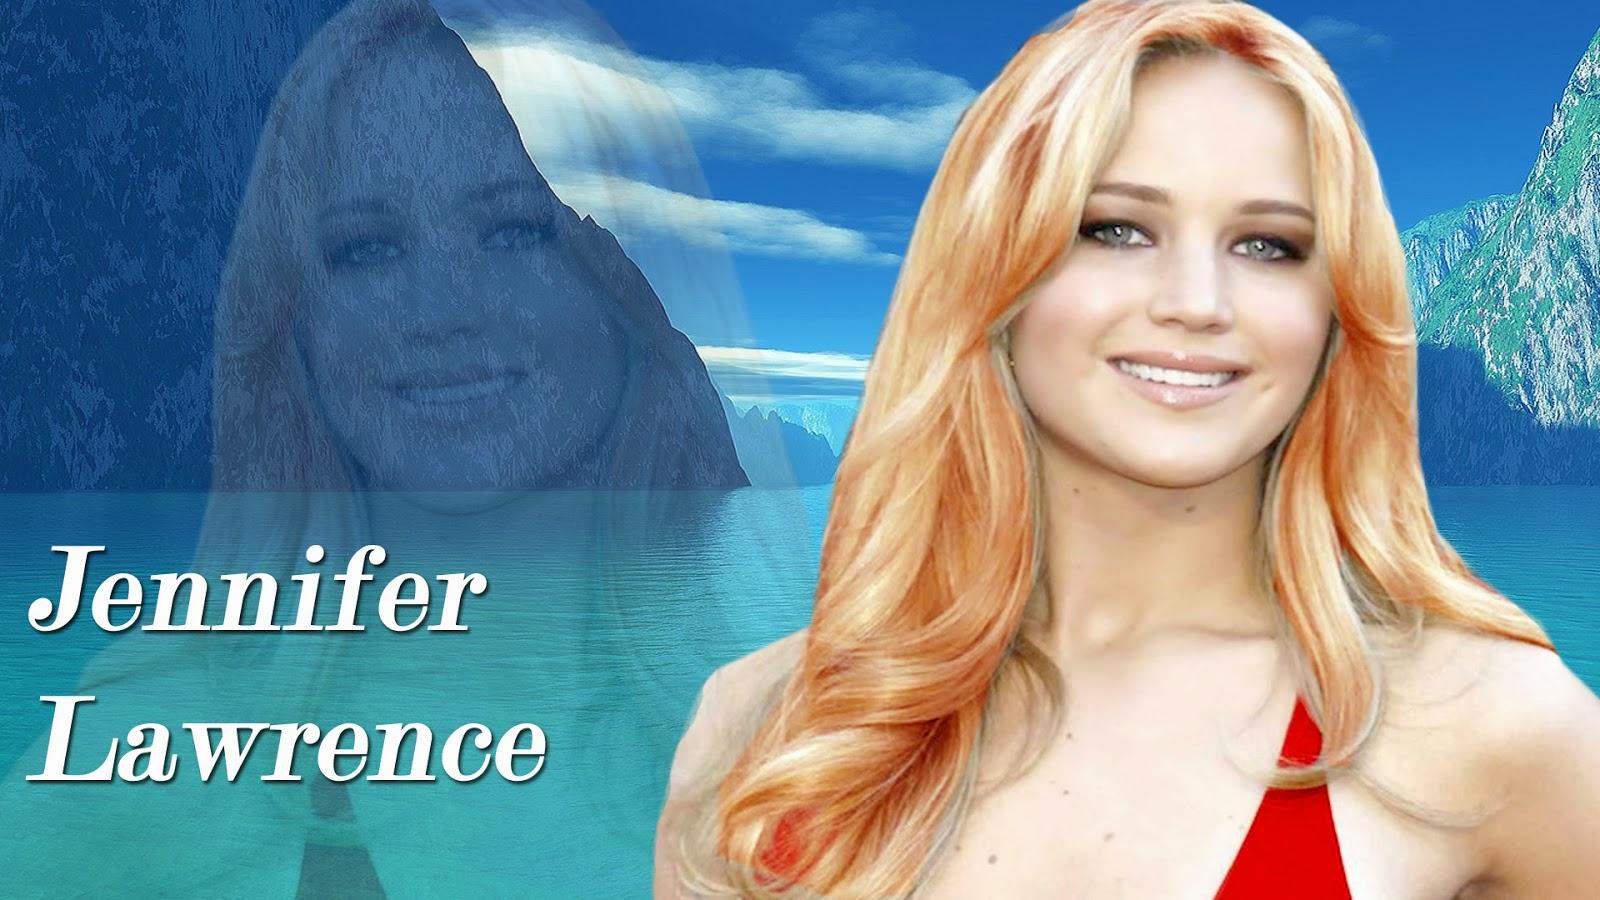 Celebrity Hd Wallpapers Jennifer Lawrence Hot Hd Images-8808